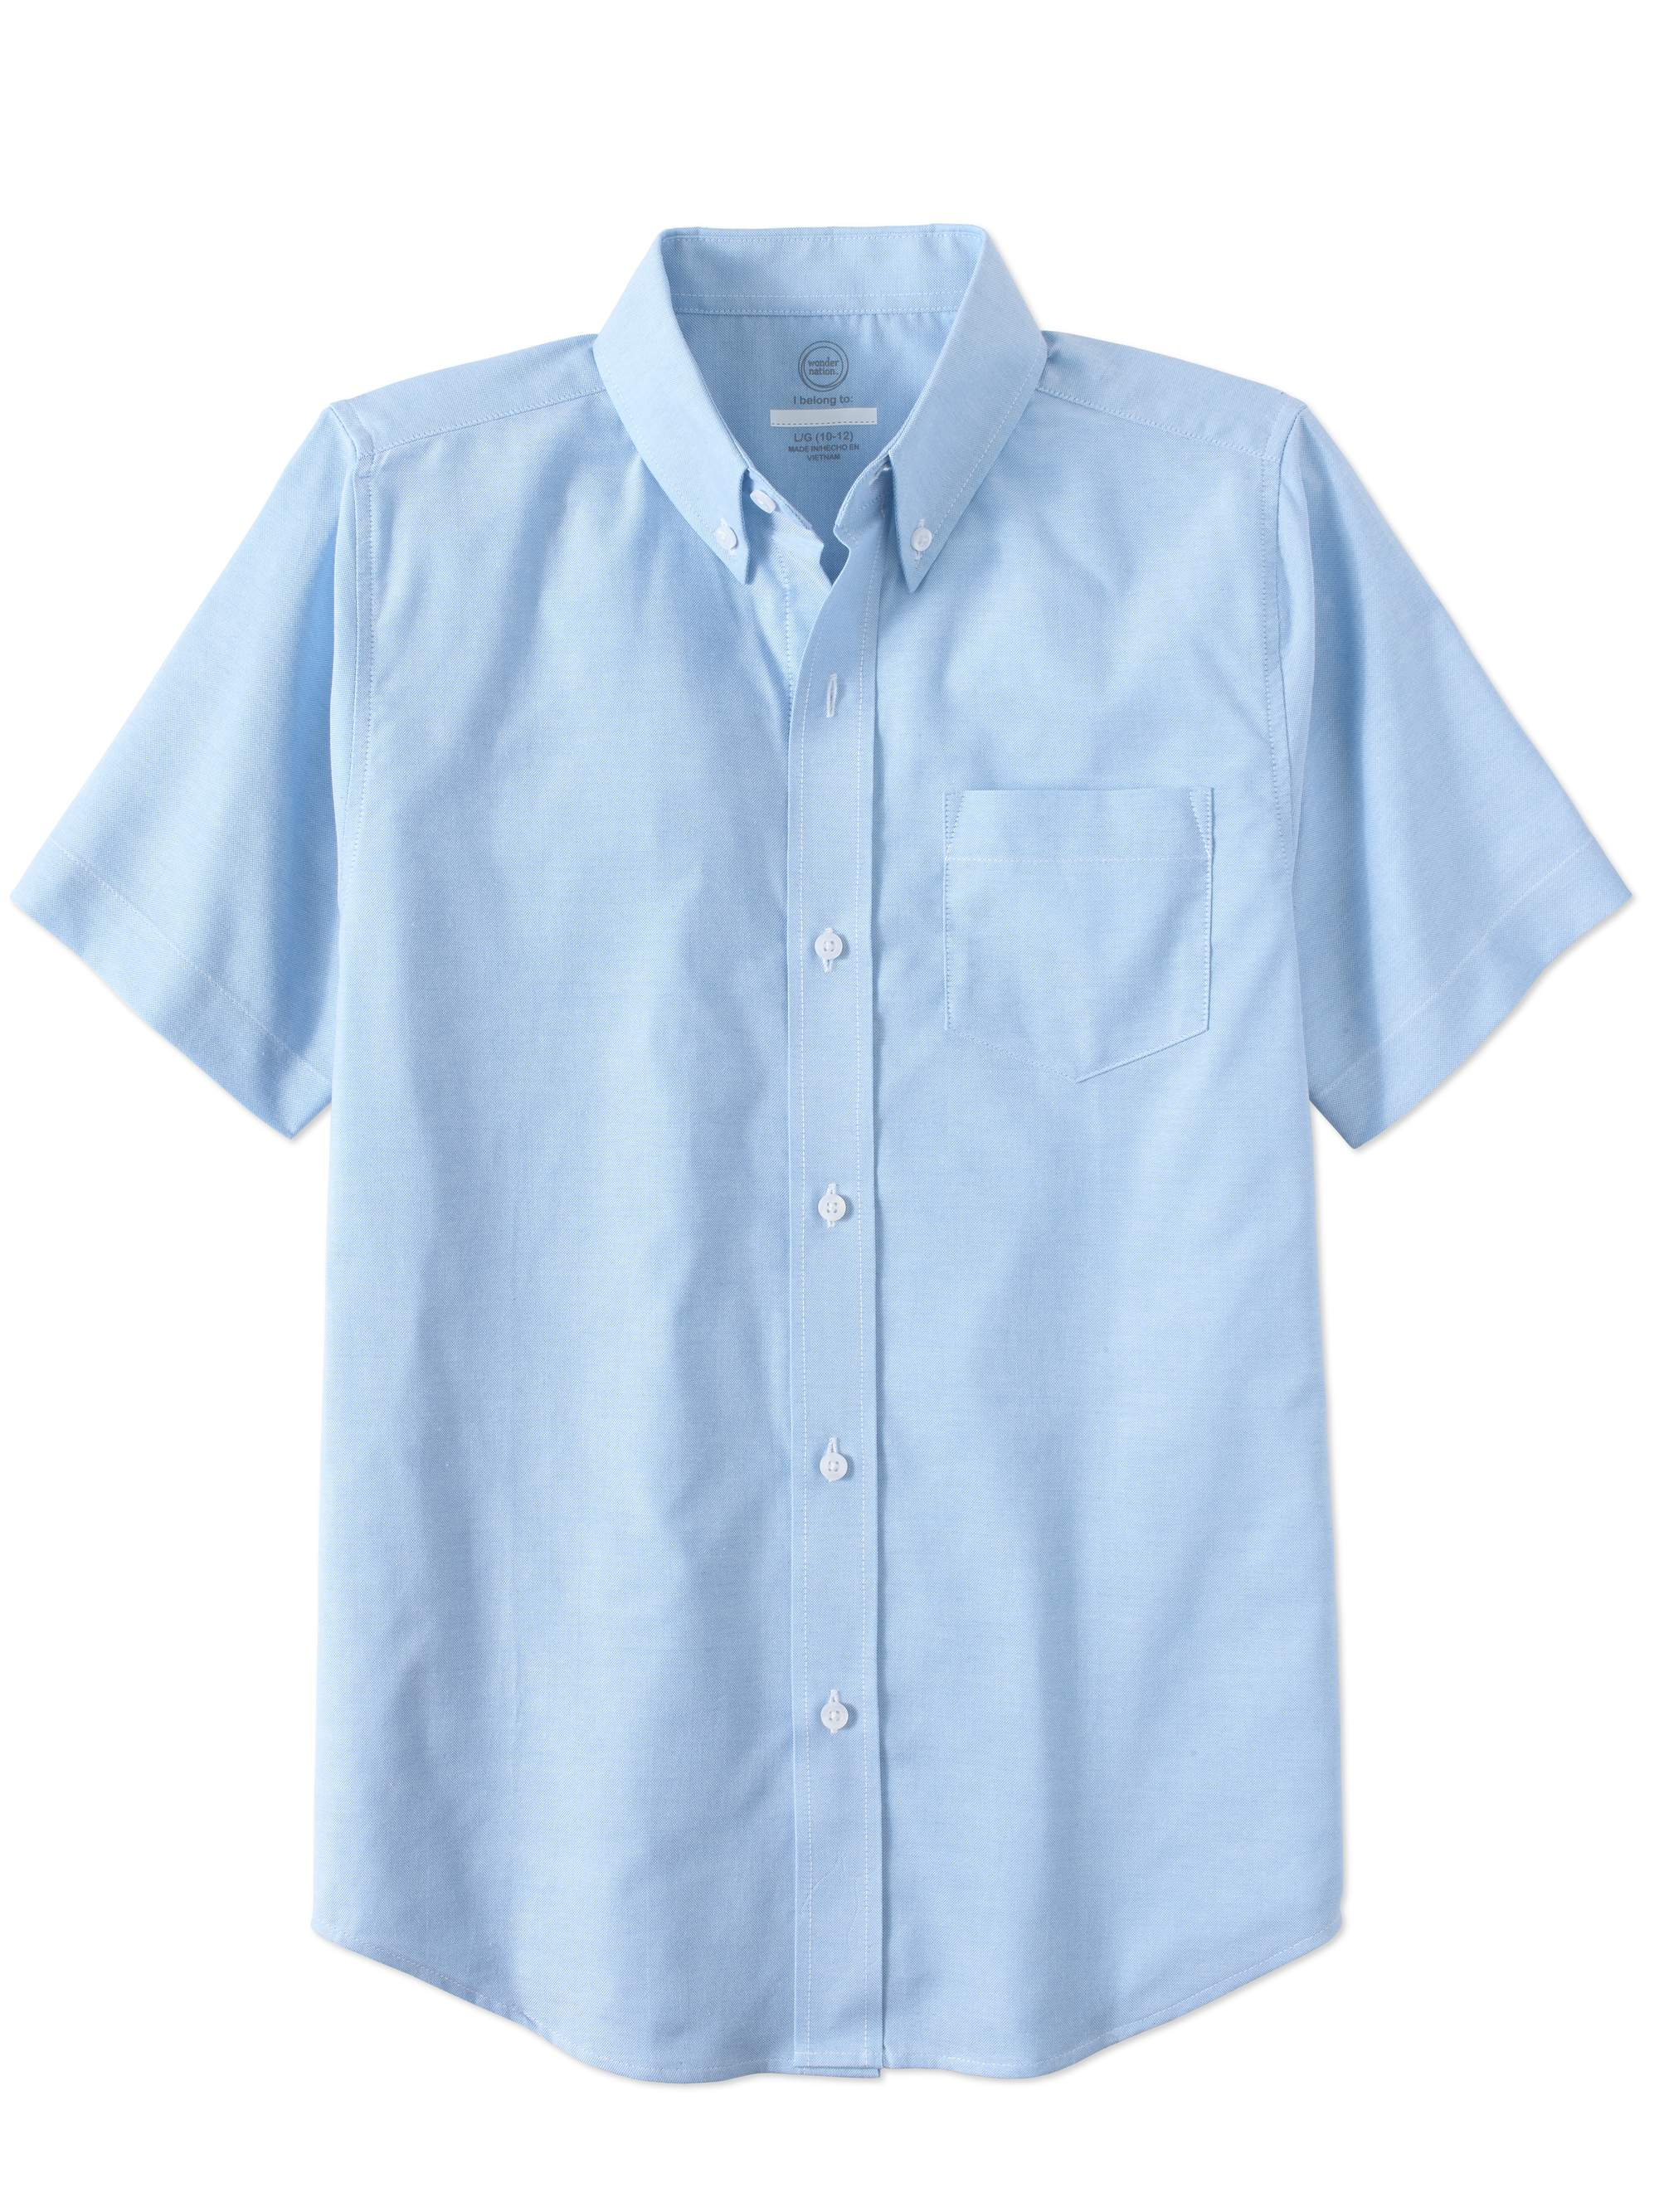 Boys School Uniform Short Sleeve Oxford Shirt